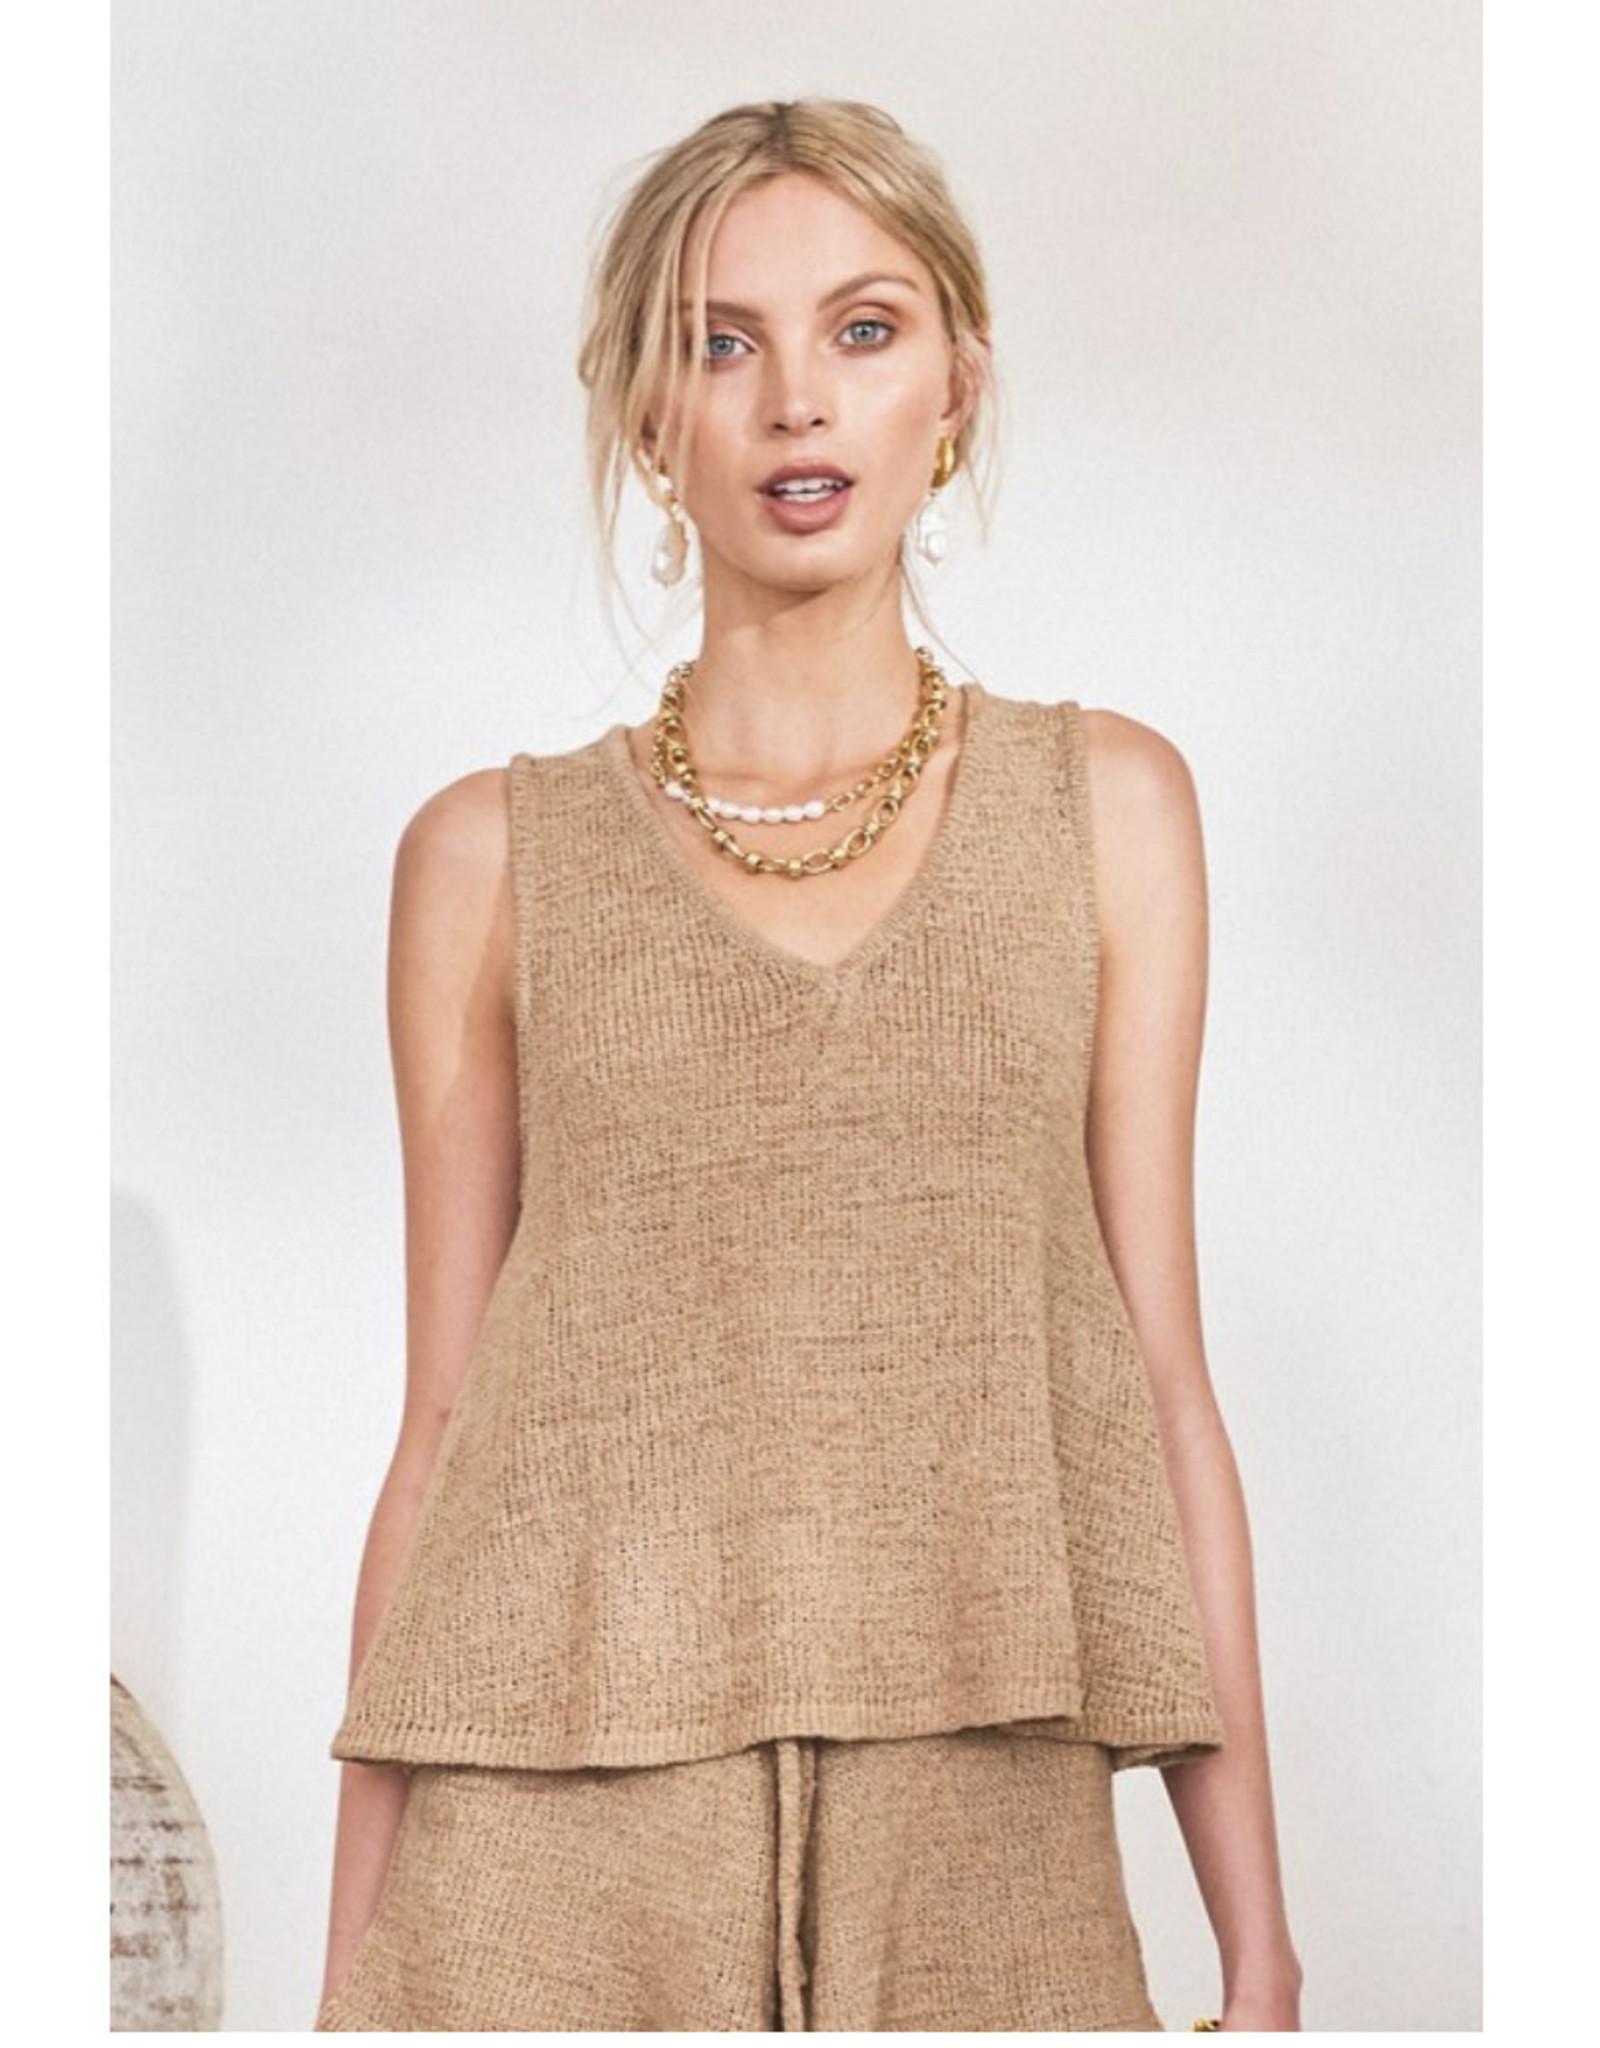 Lost in Lunar Lost in Lunar - Amy knit top (nude)